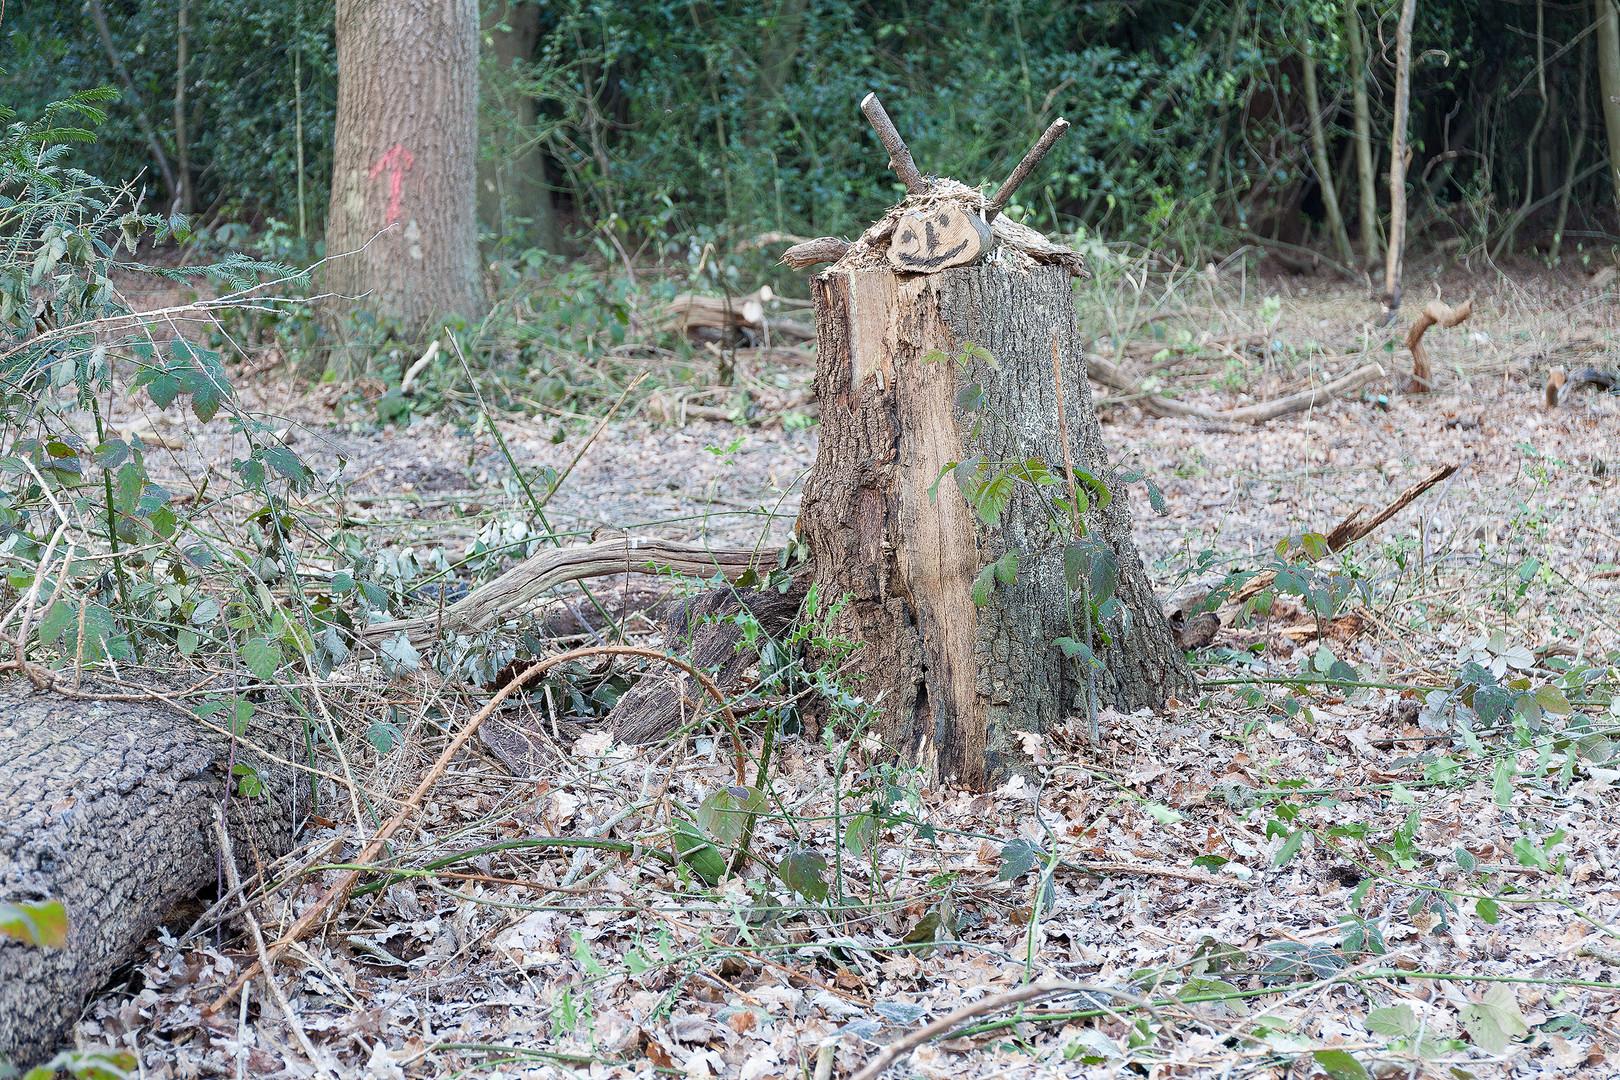 Woodland art, face drawn on log placed on top of tree stump, Wimbledon Common, London, England, UK.